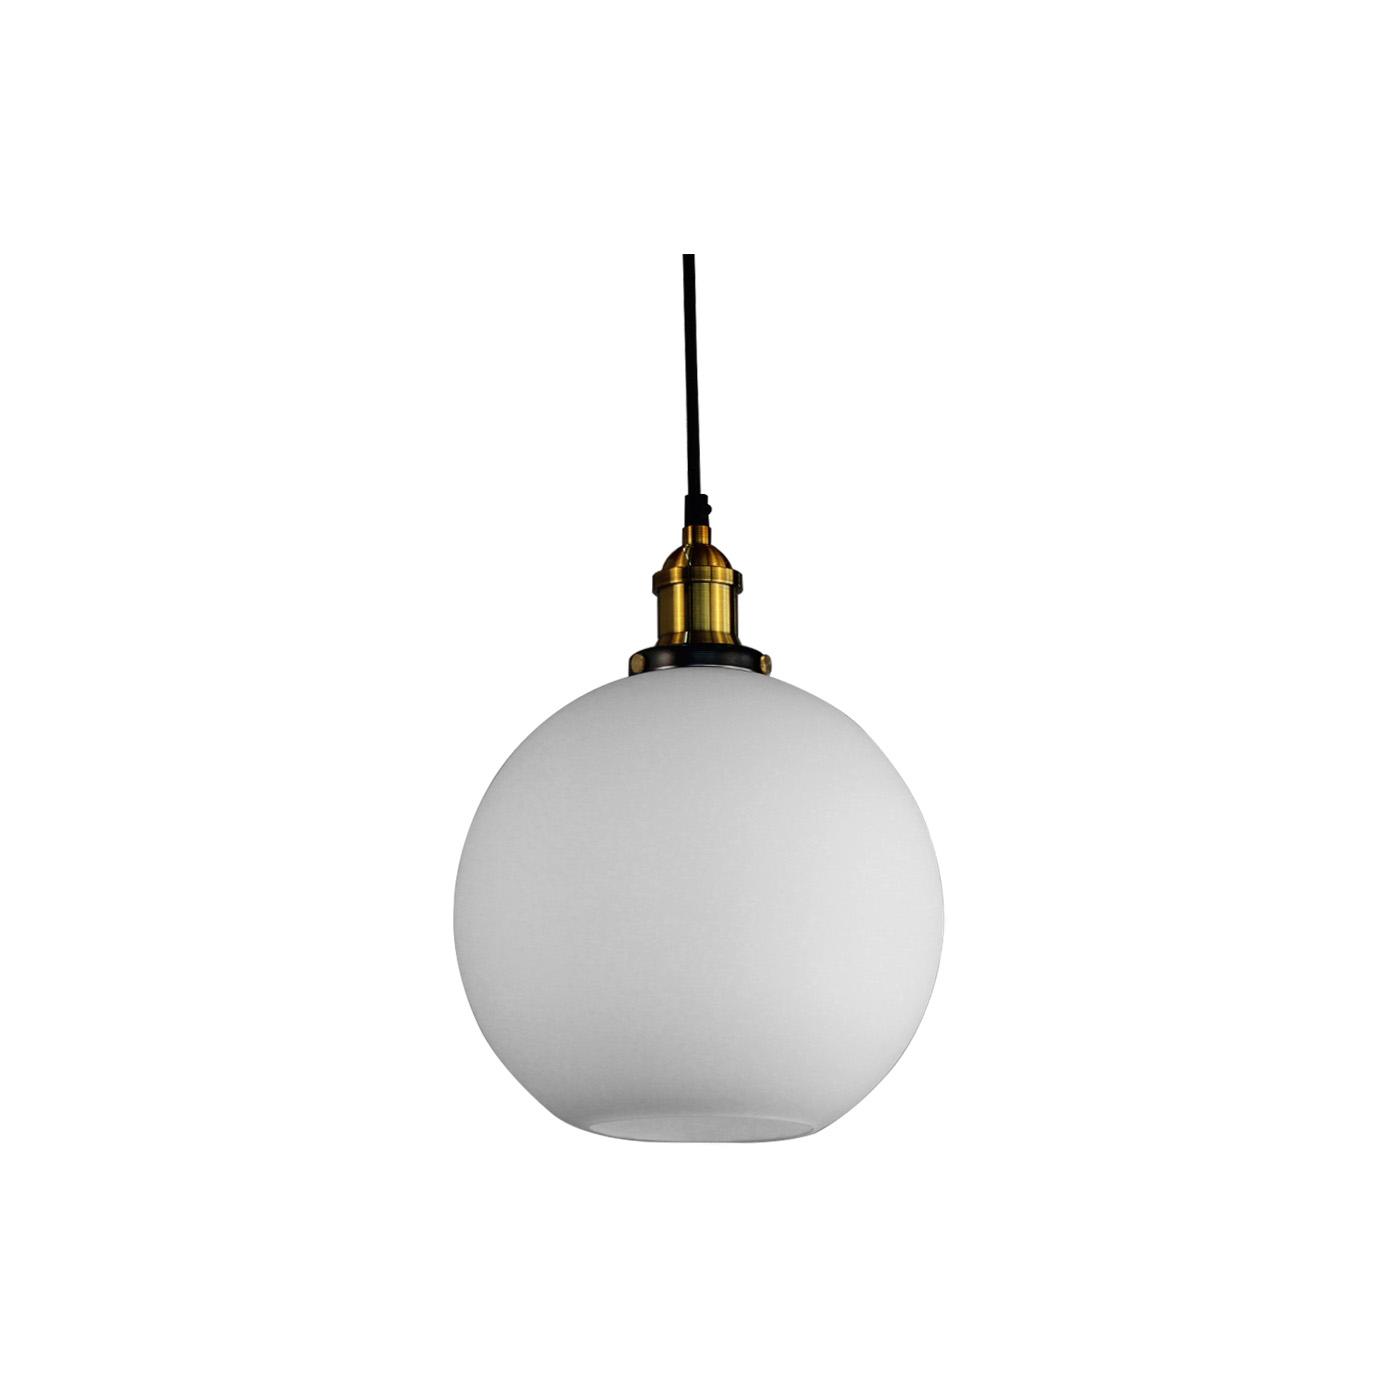 Cristallo Ceiling Lamp